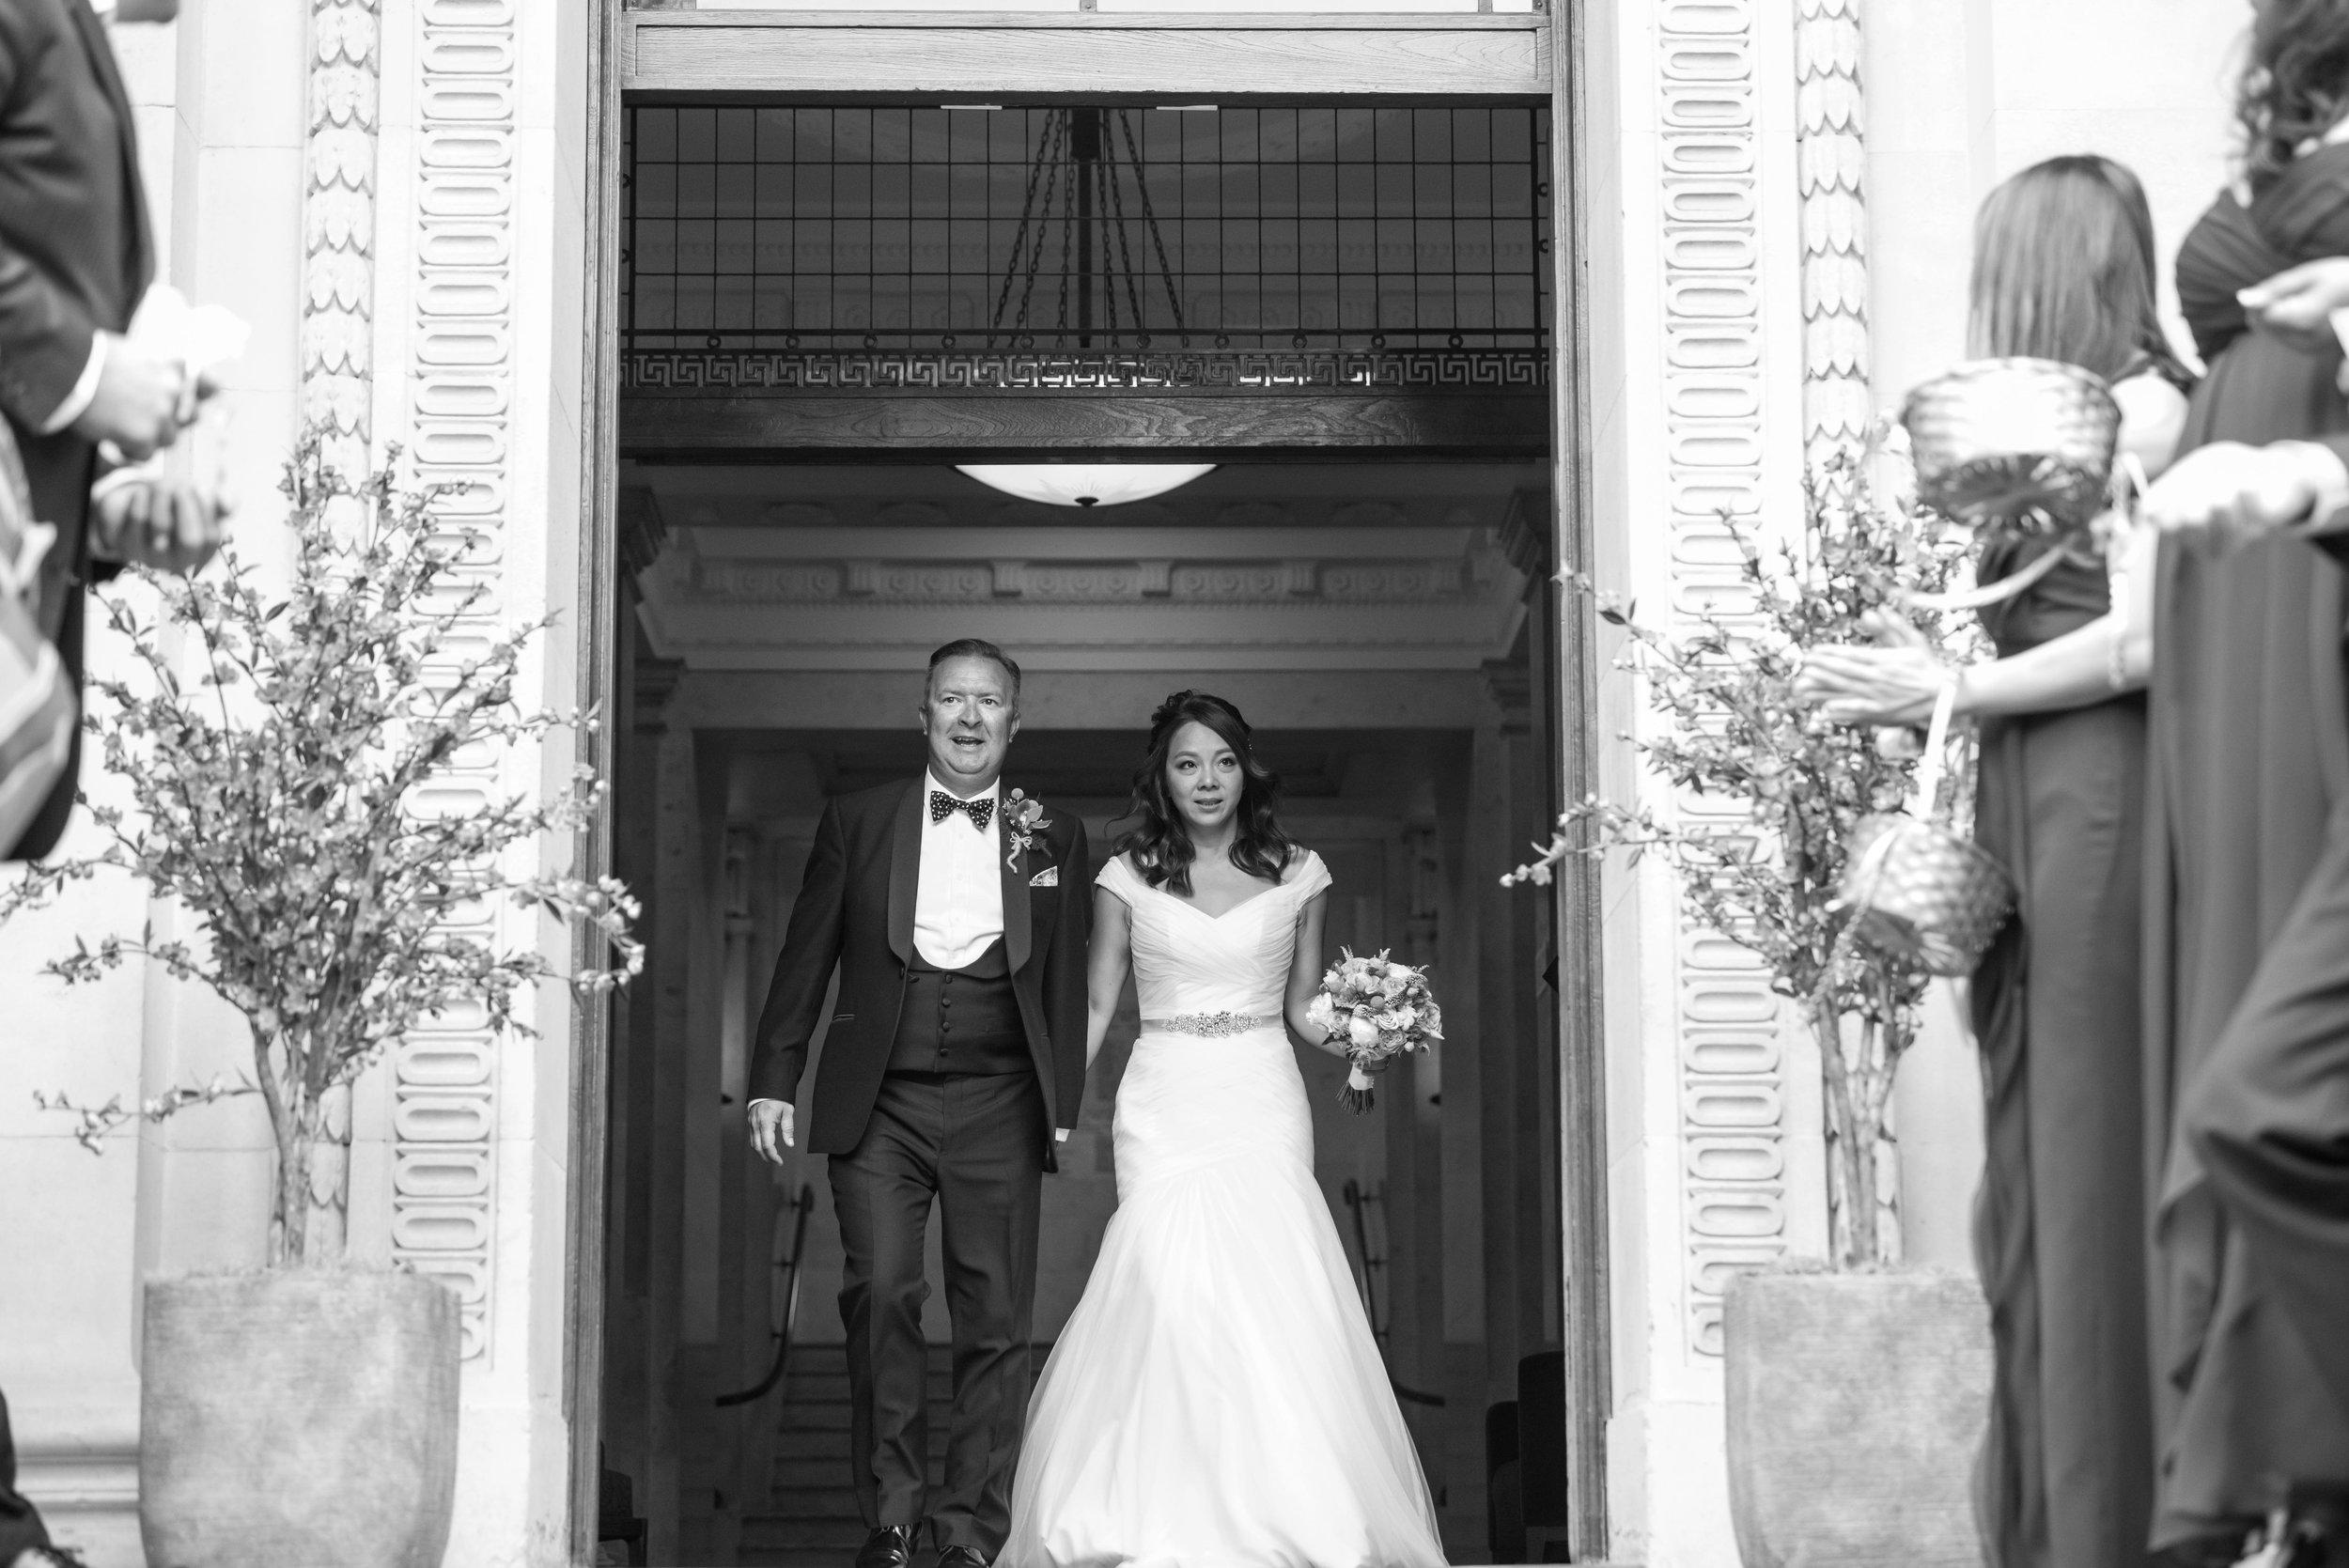 D&M_Marylebone Town Hall Wedding (125 of 239).jpg